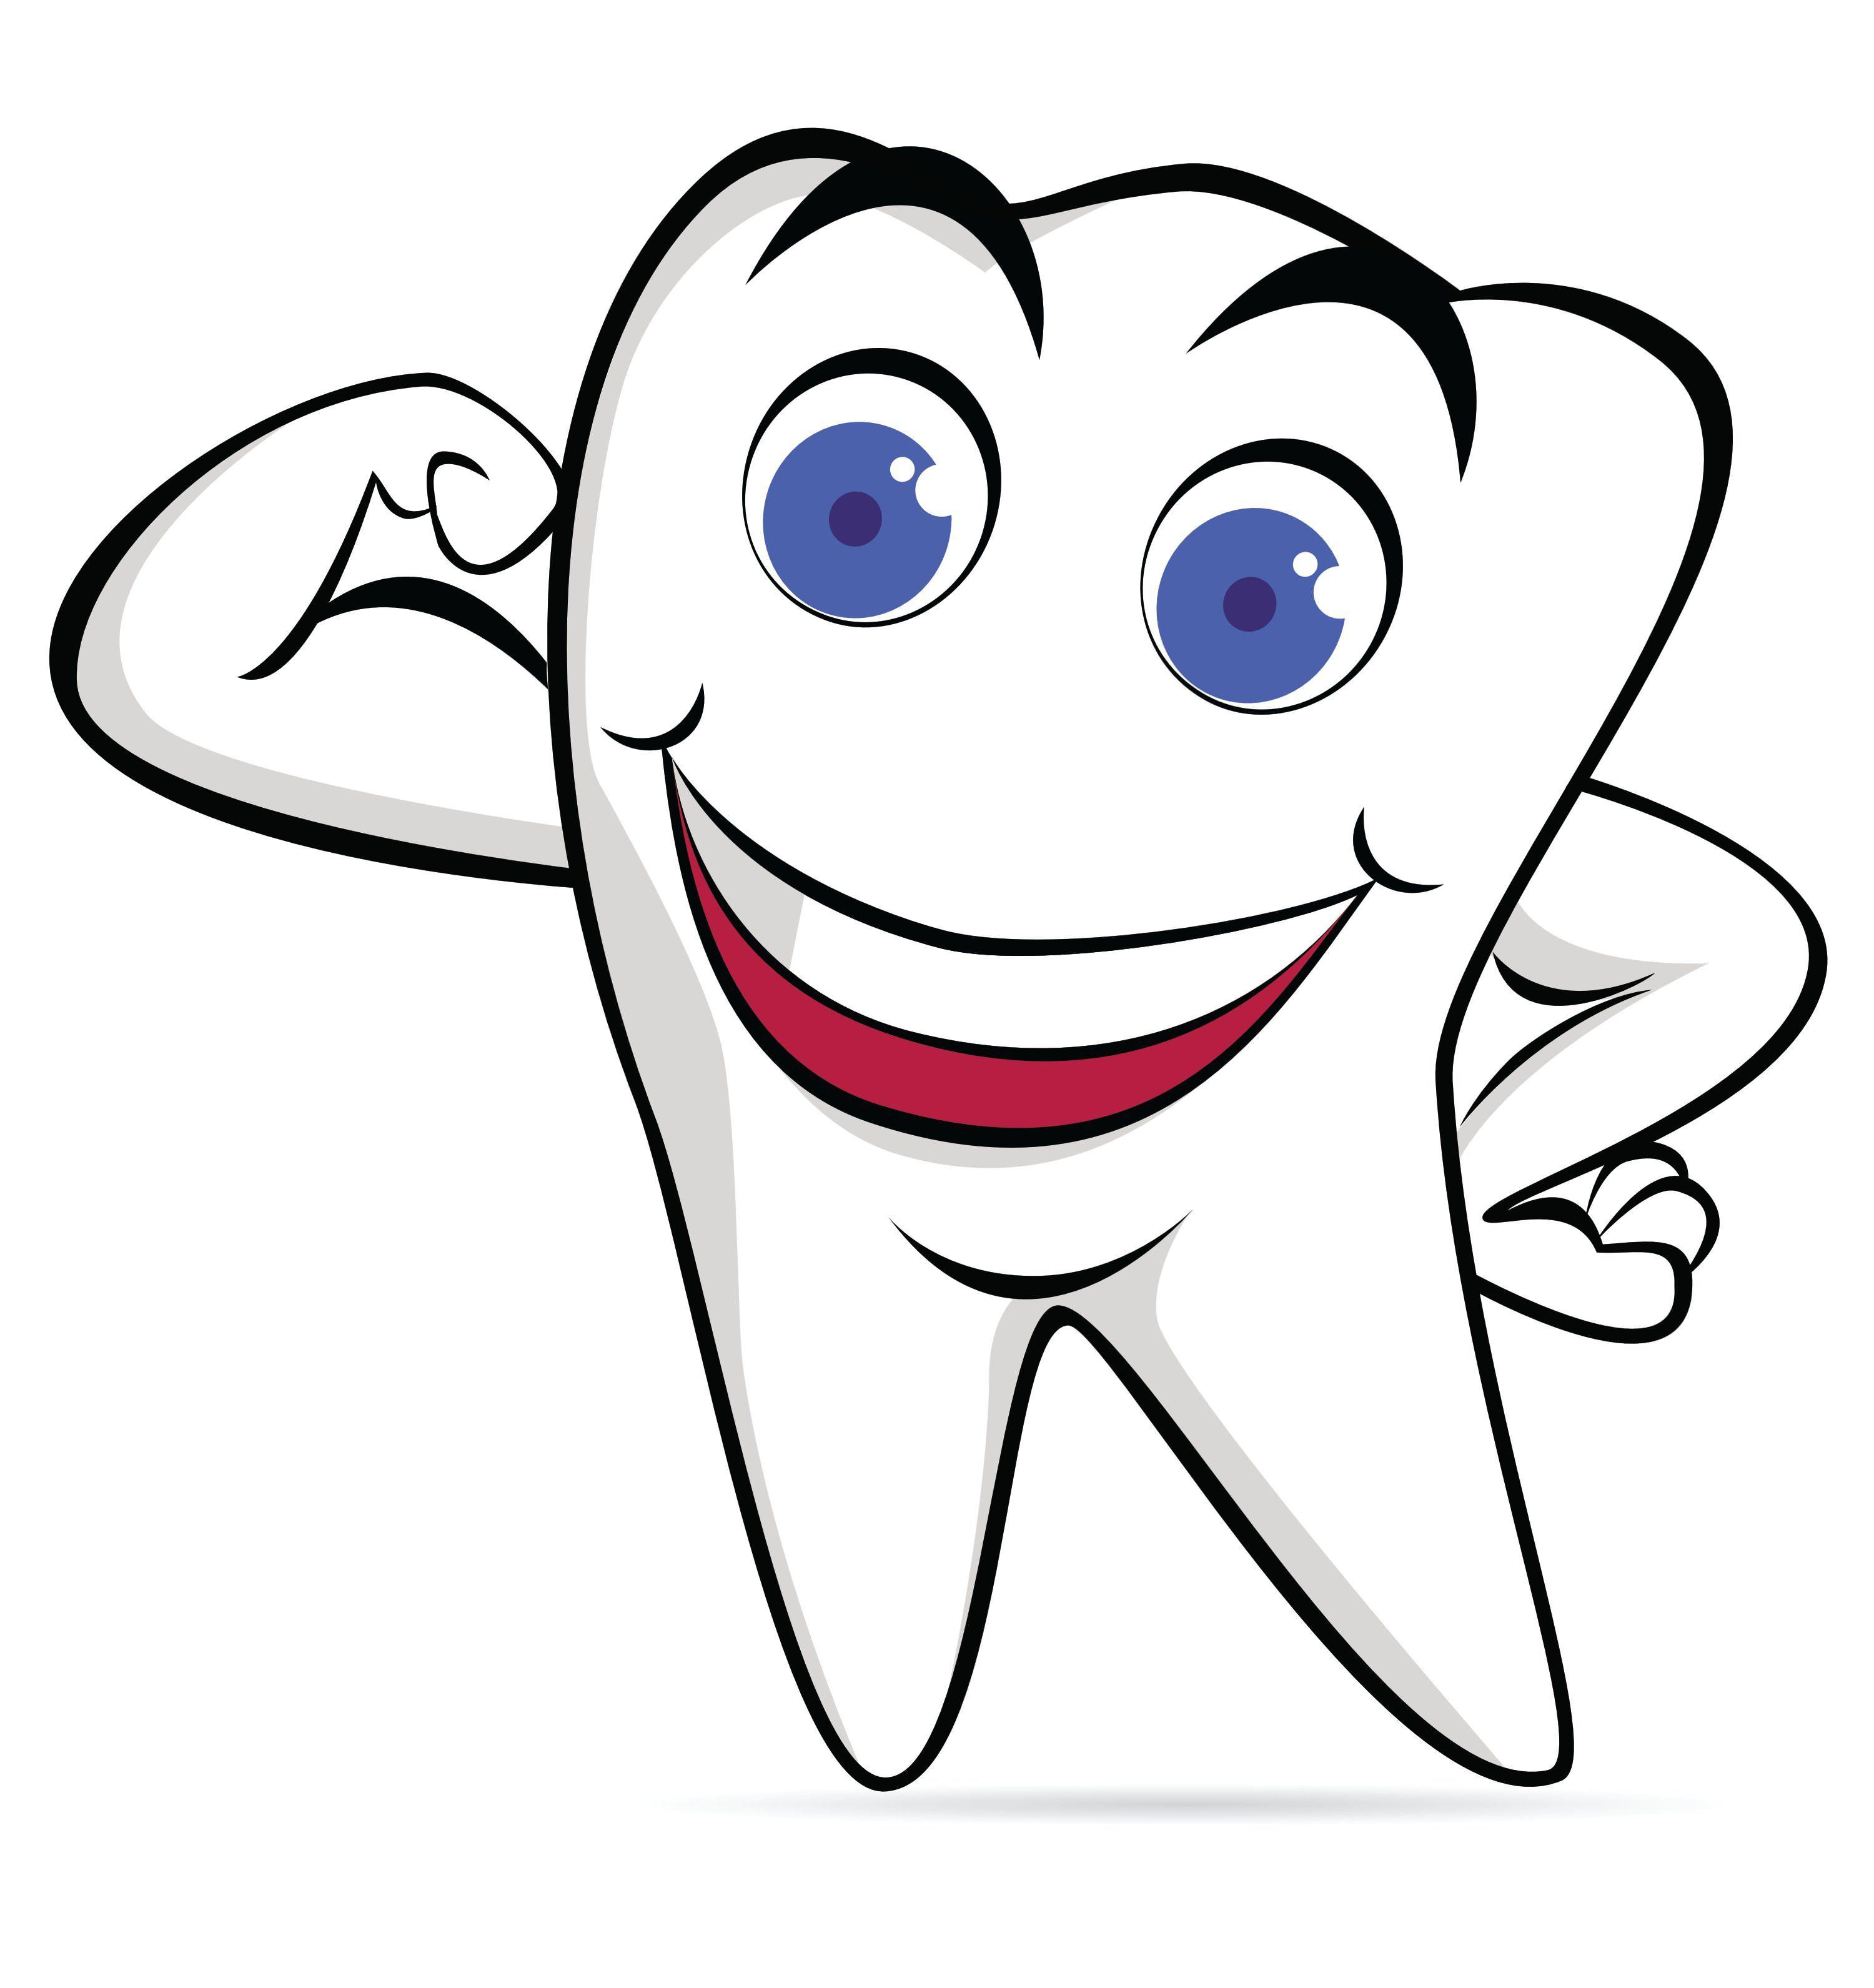 Cartoon teeth clip art your local cosmetic dentist tooth